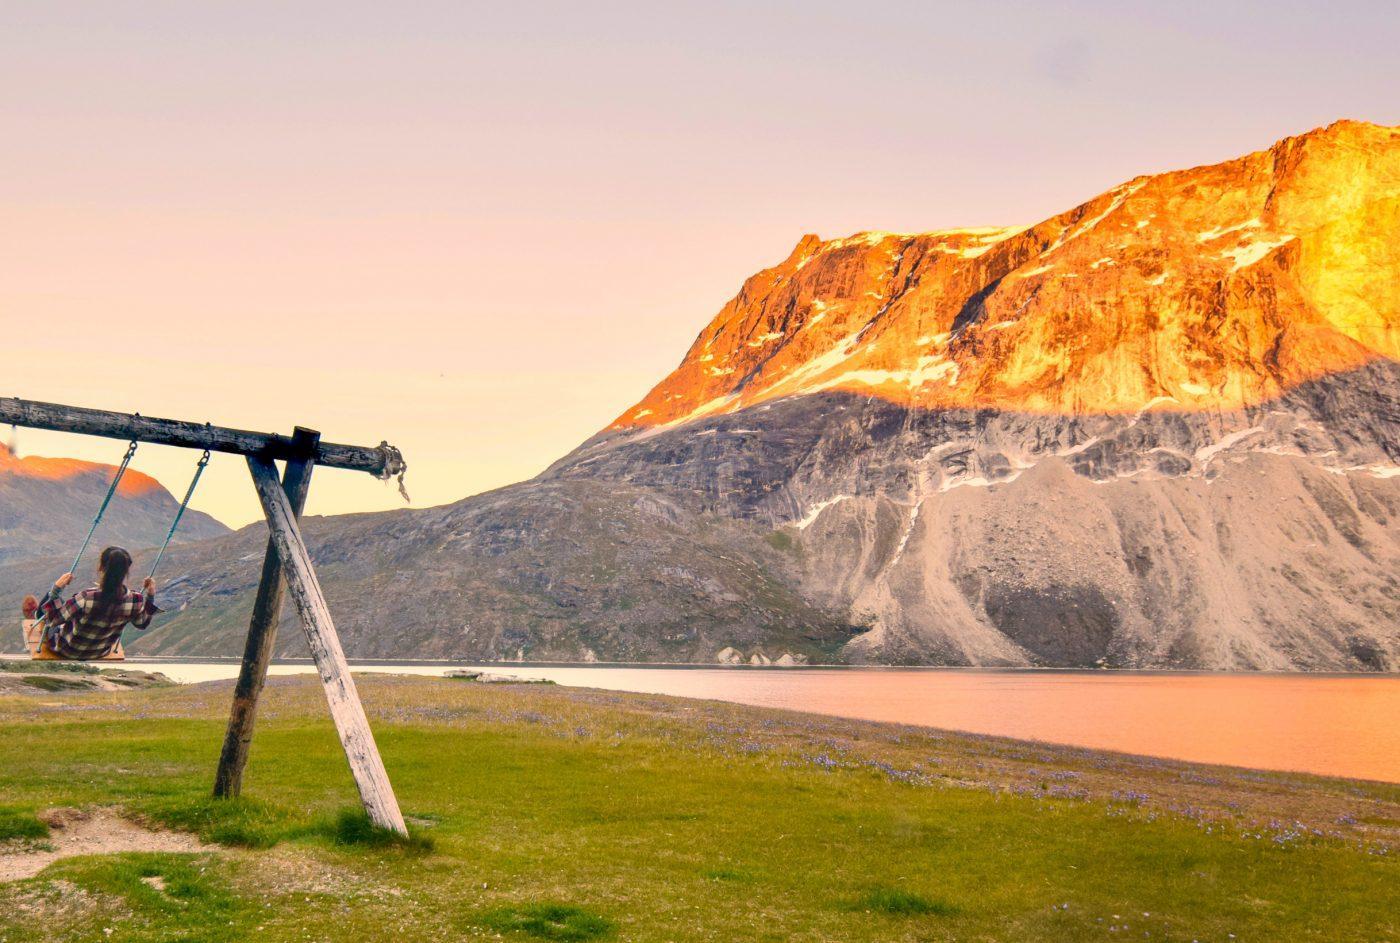 Greenland sunset swing. Photo by Lauren Breedlove